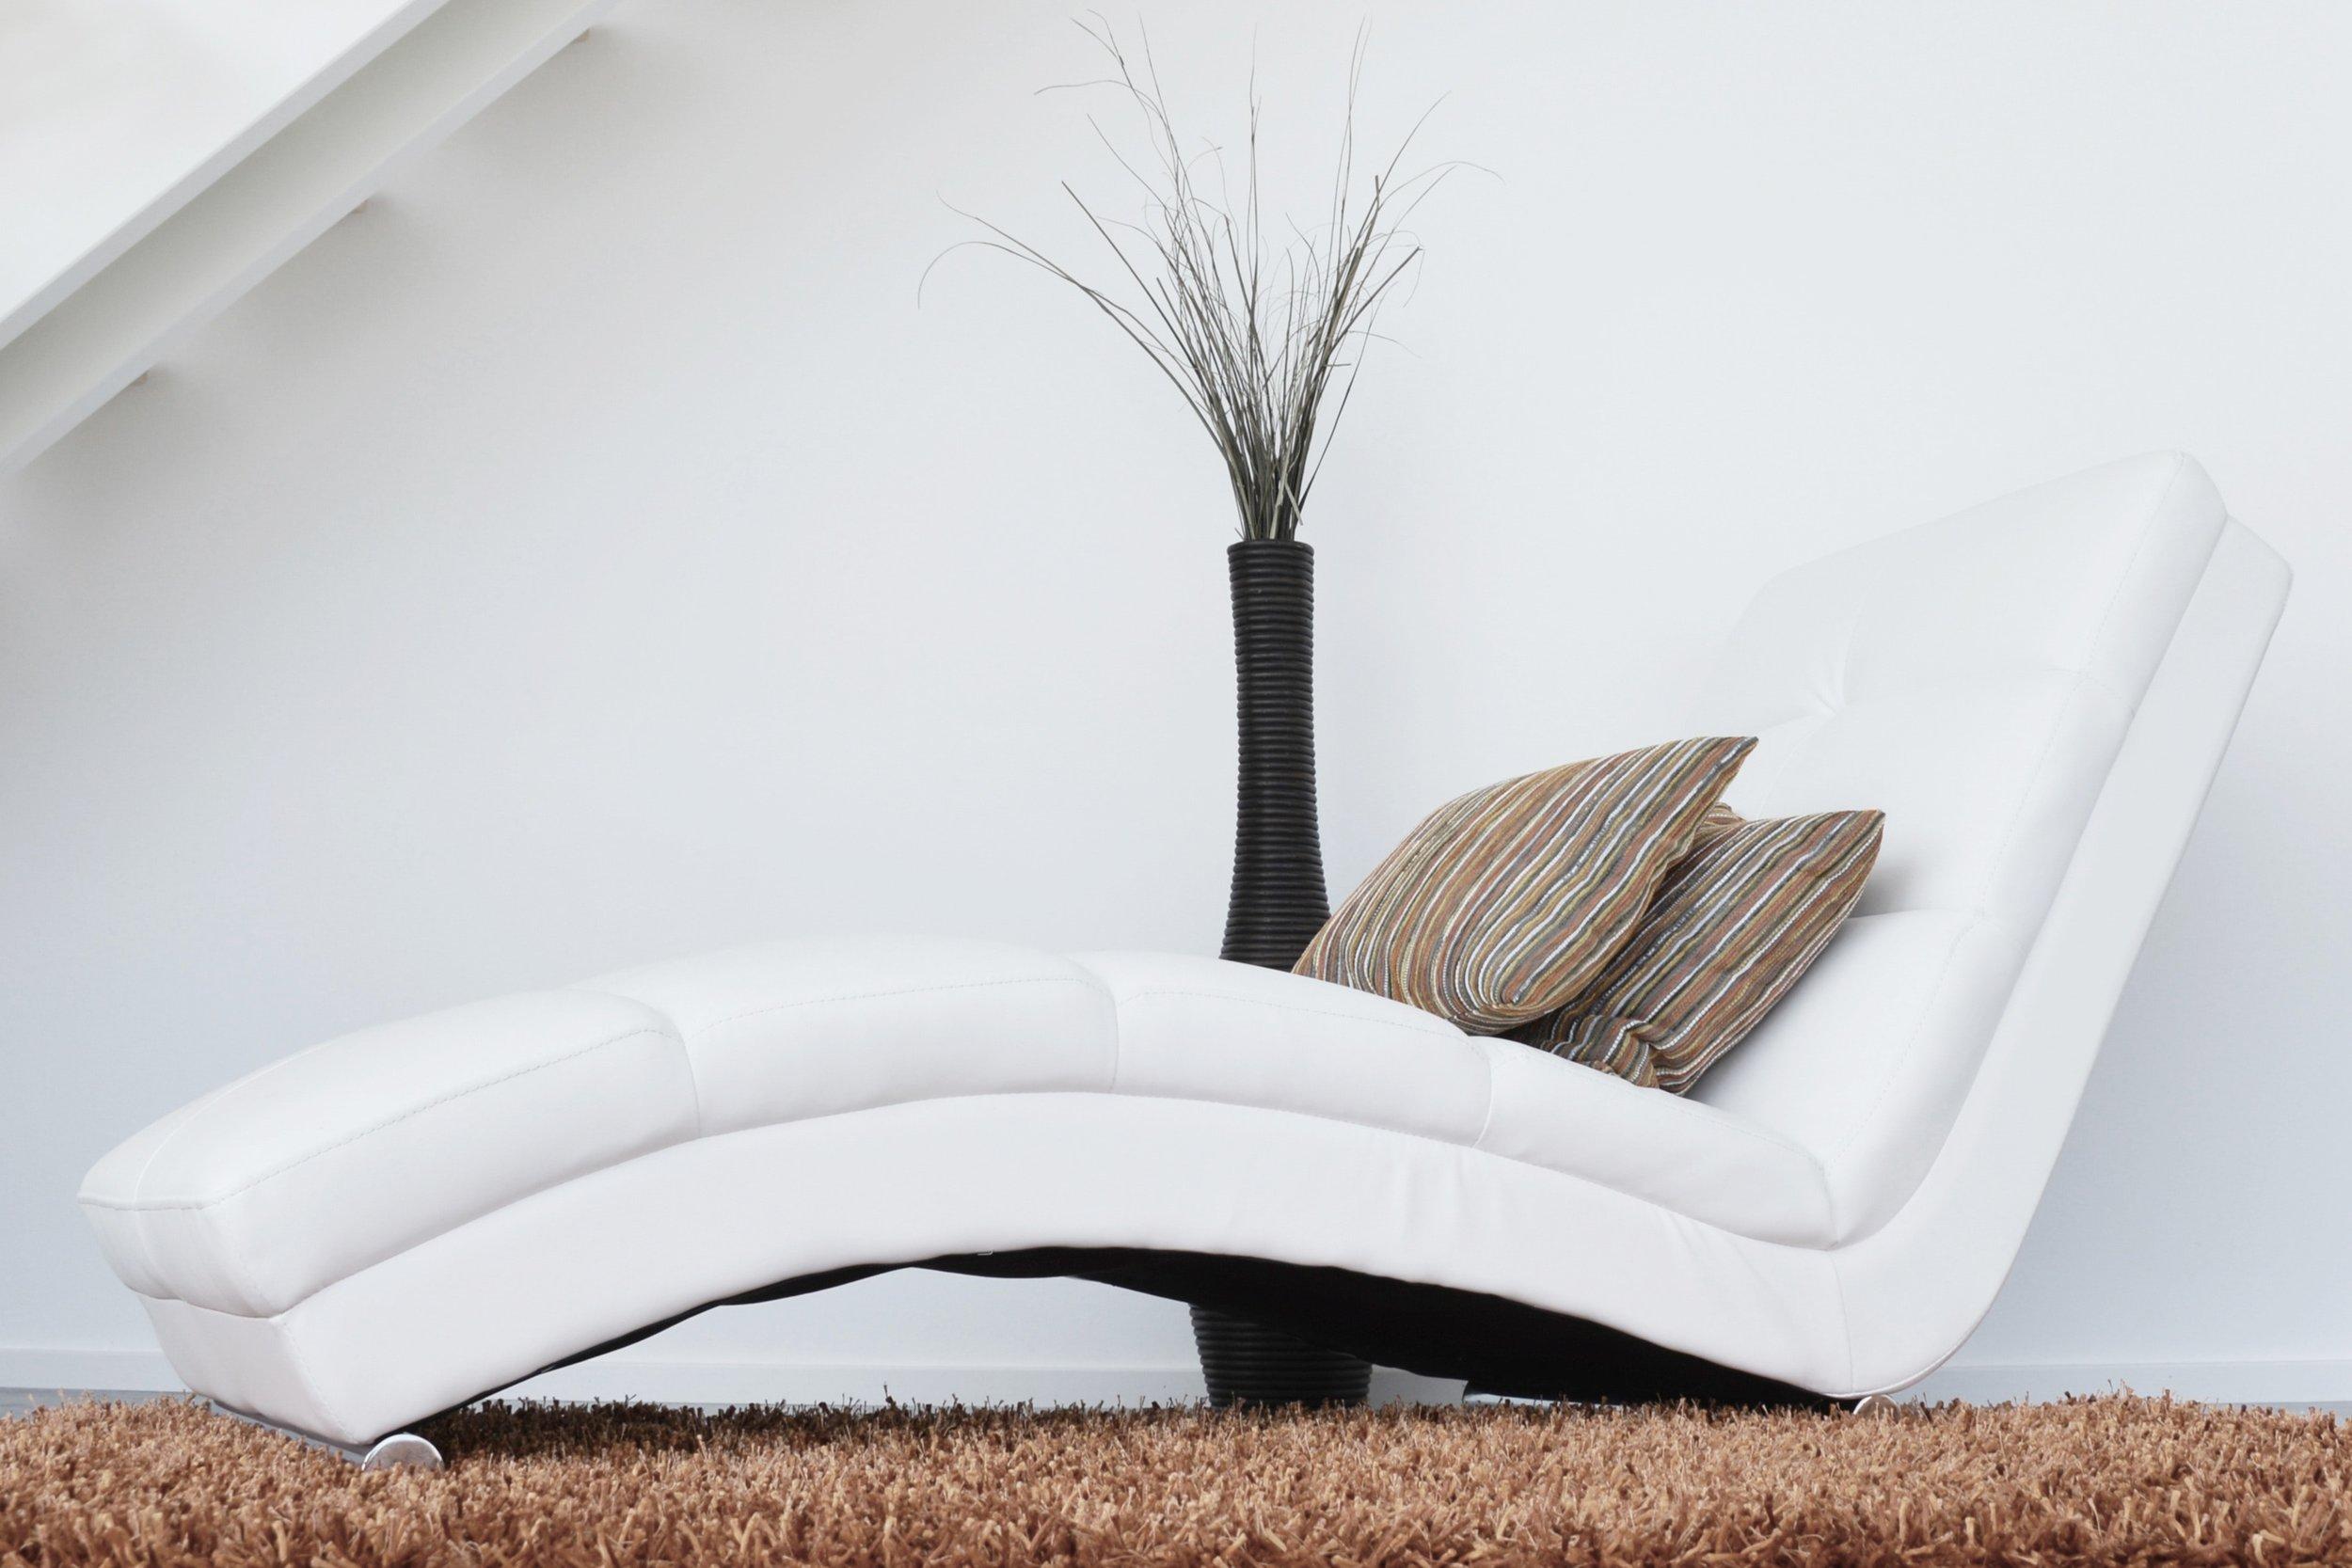 architecture-carpet-chair-276534 (2).jpg